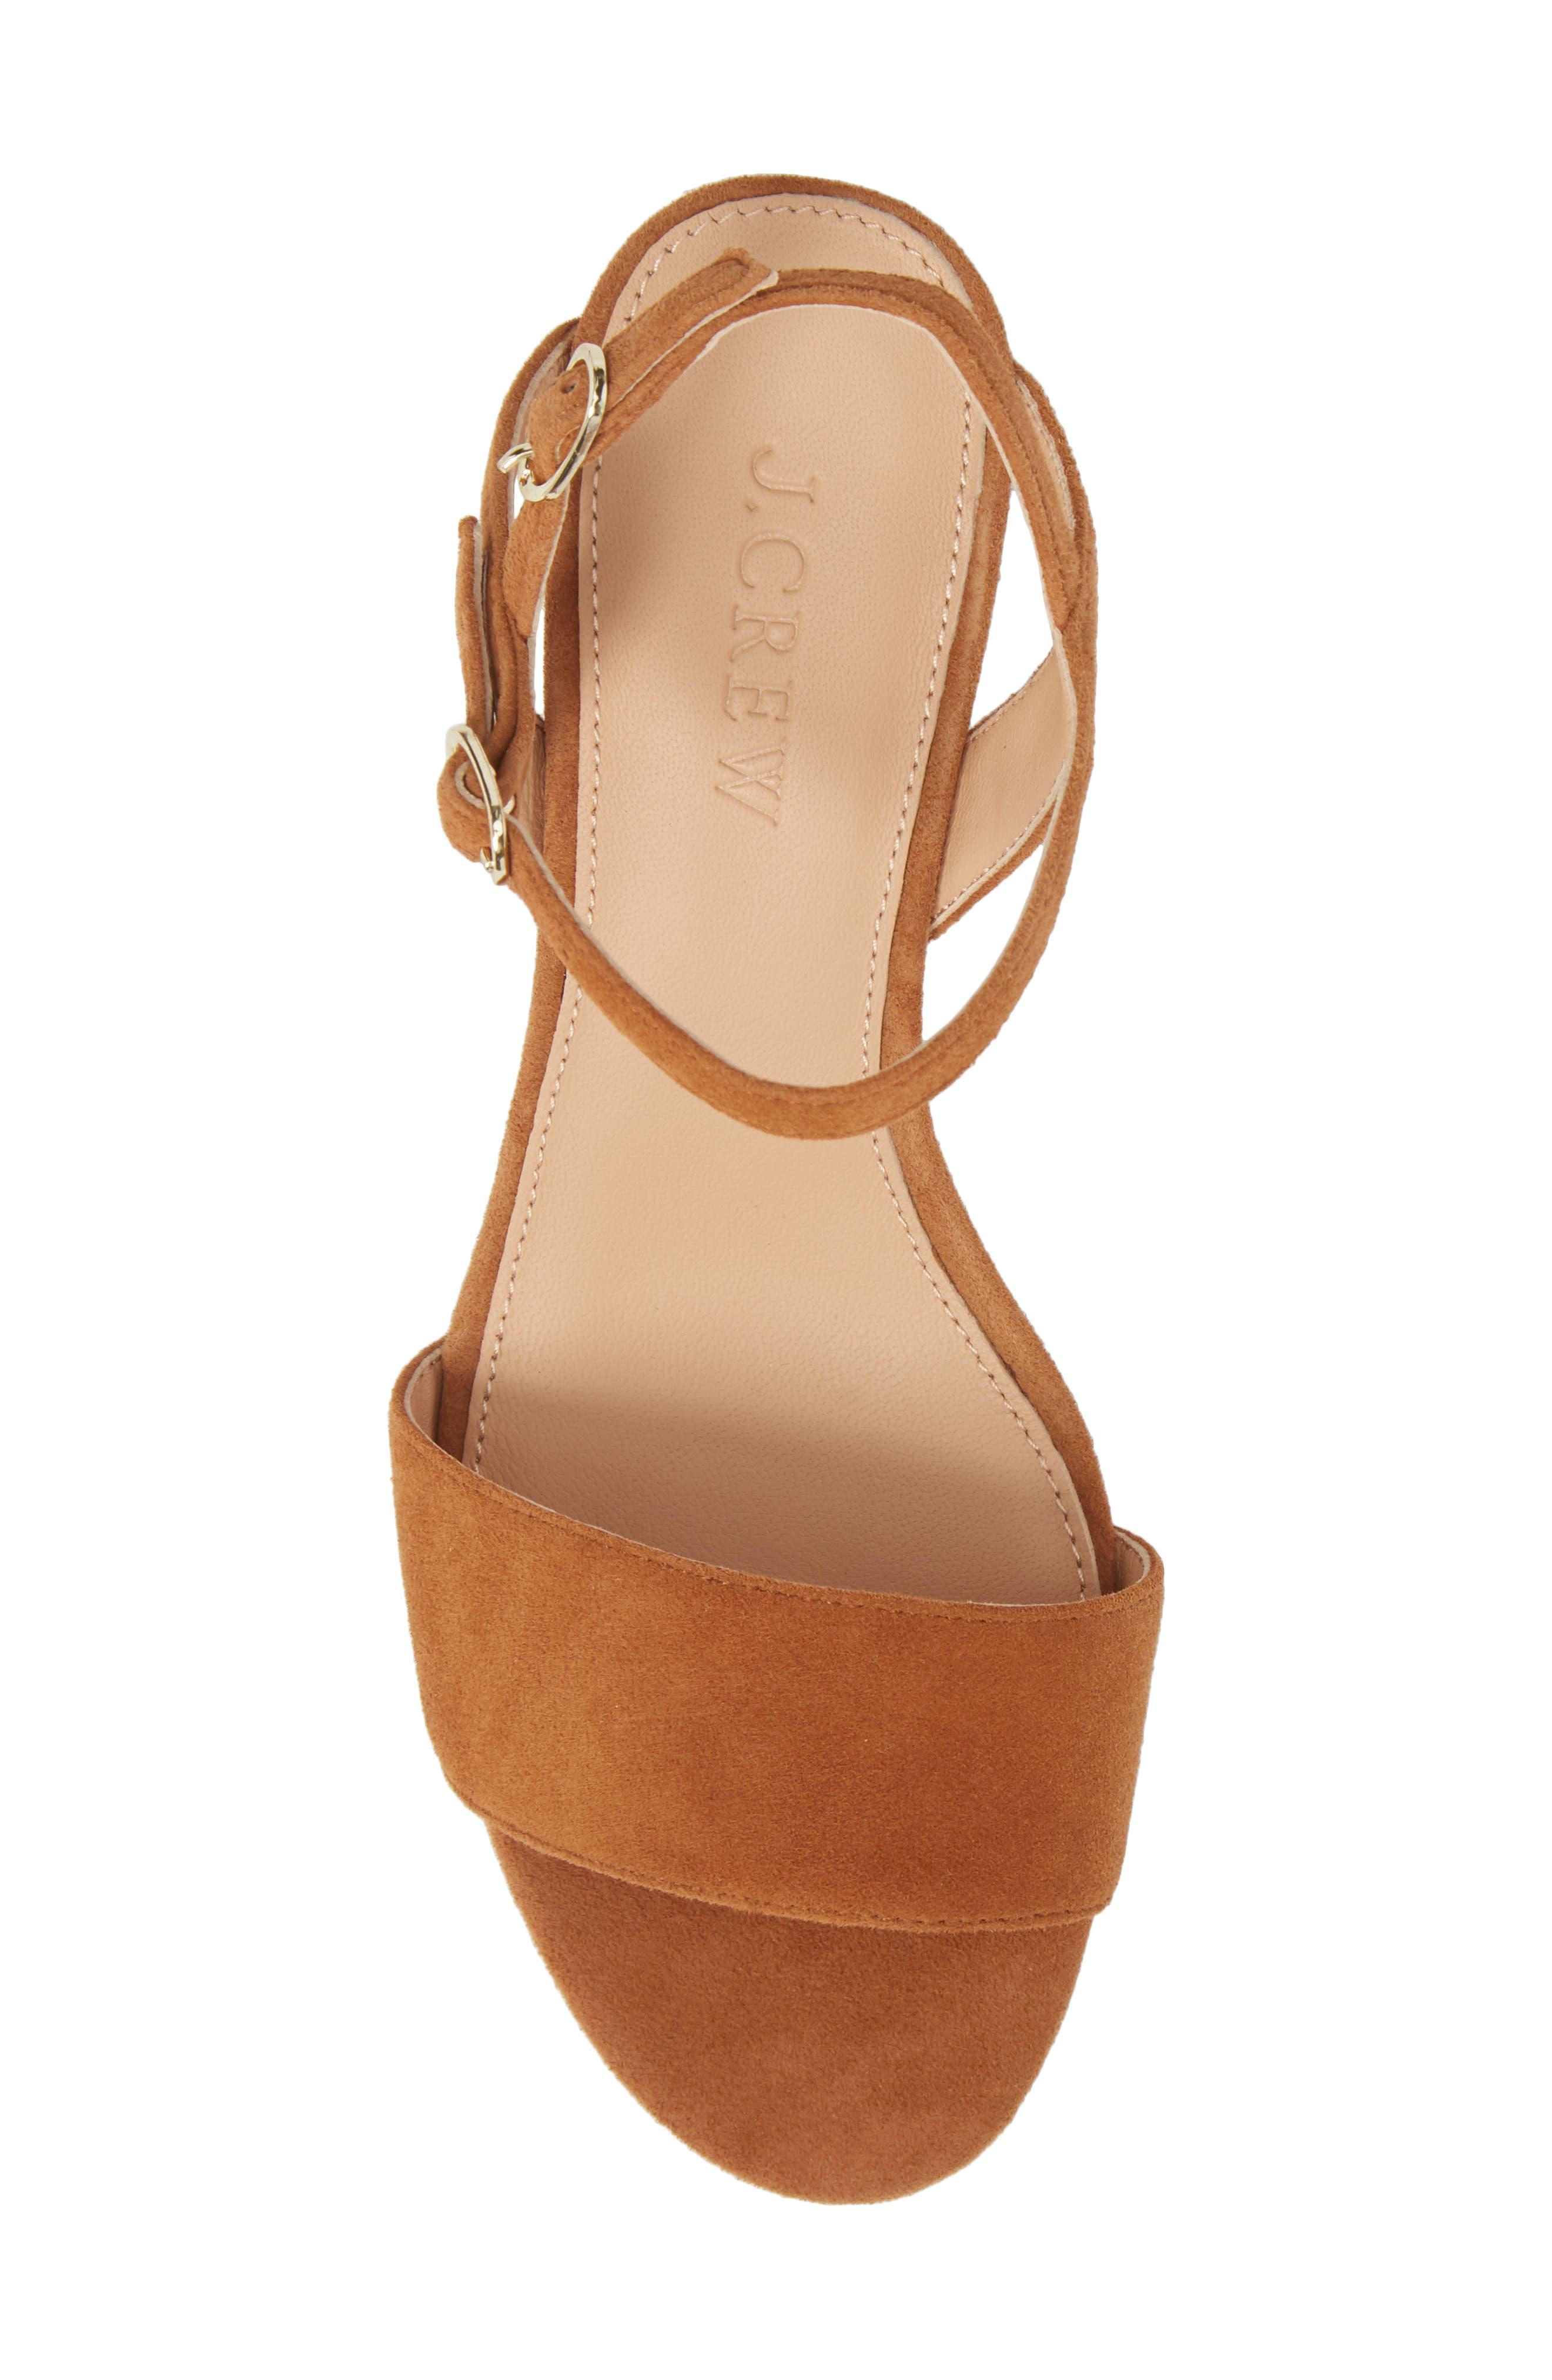 Strappy Block Heel Sandal,                             Alternate thumbnail 12, color,